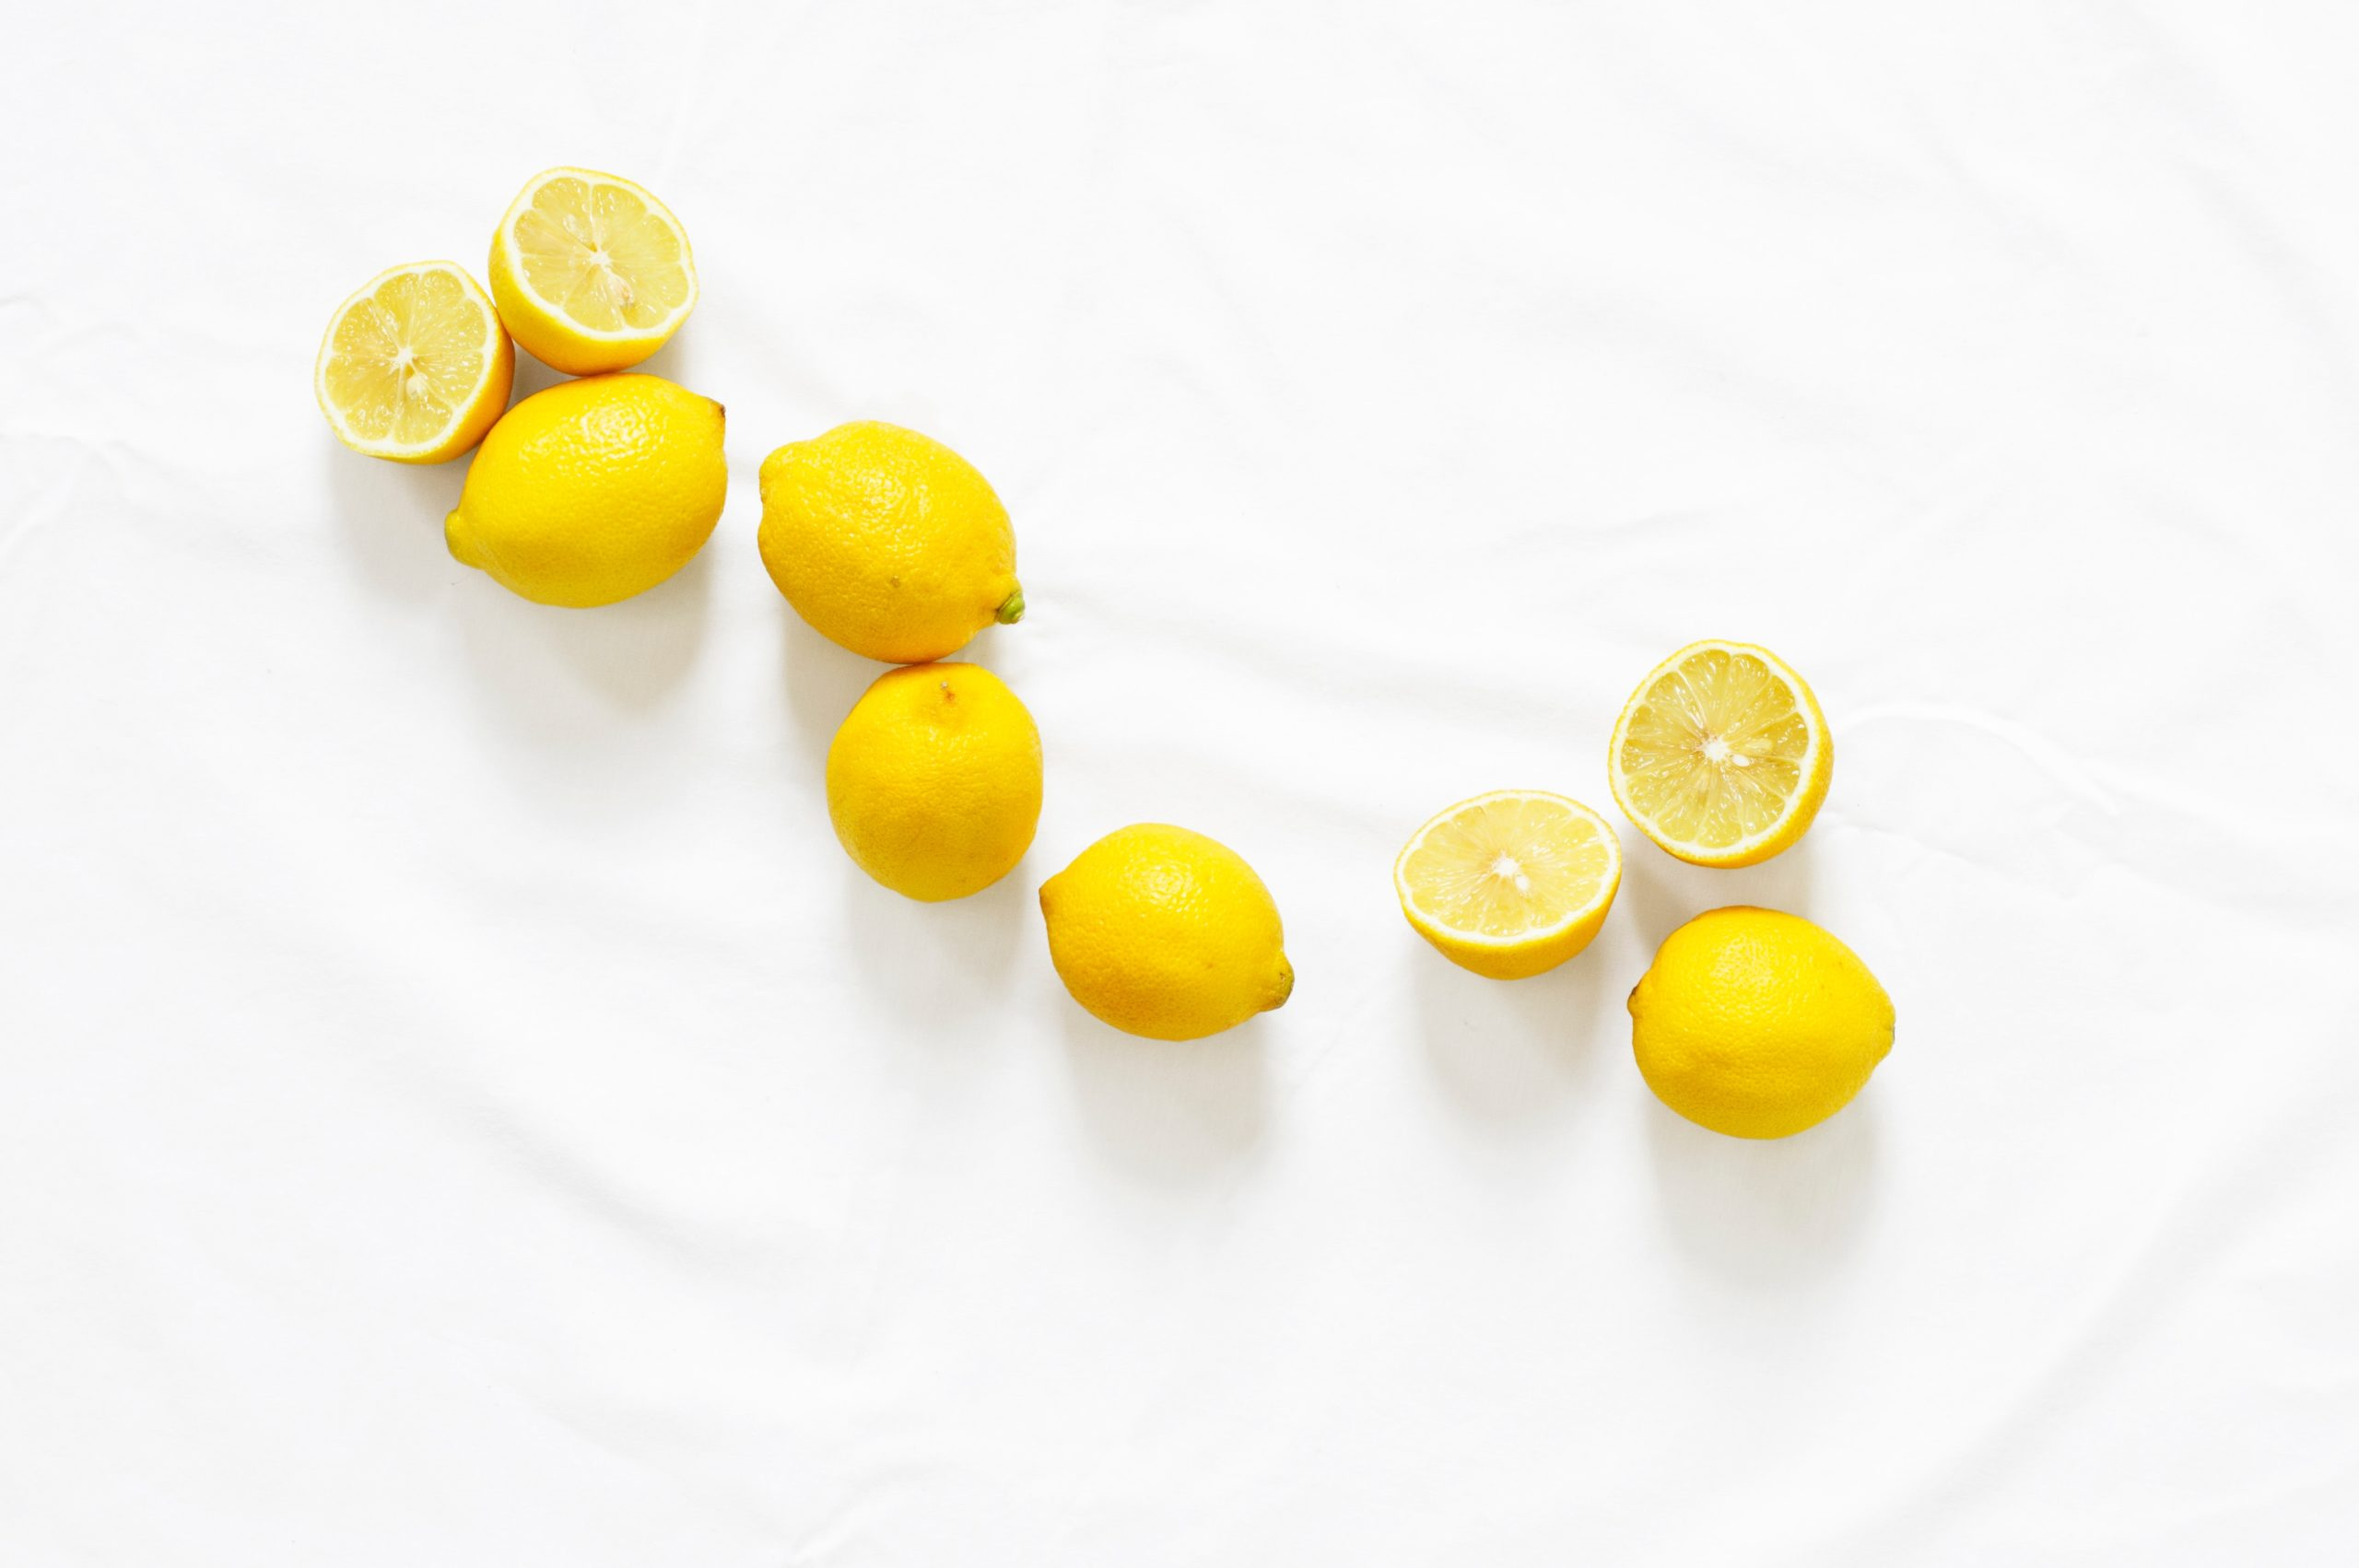 limunska kiselina povećanje kiseline u vinu